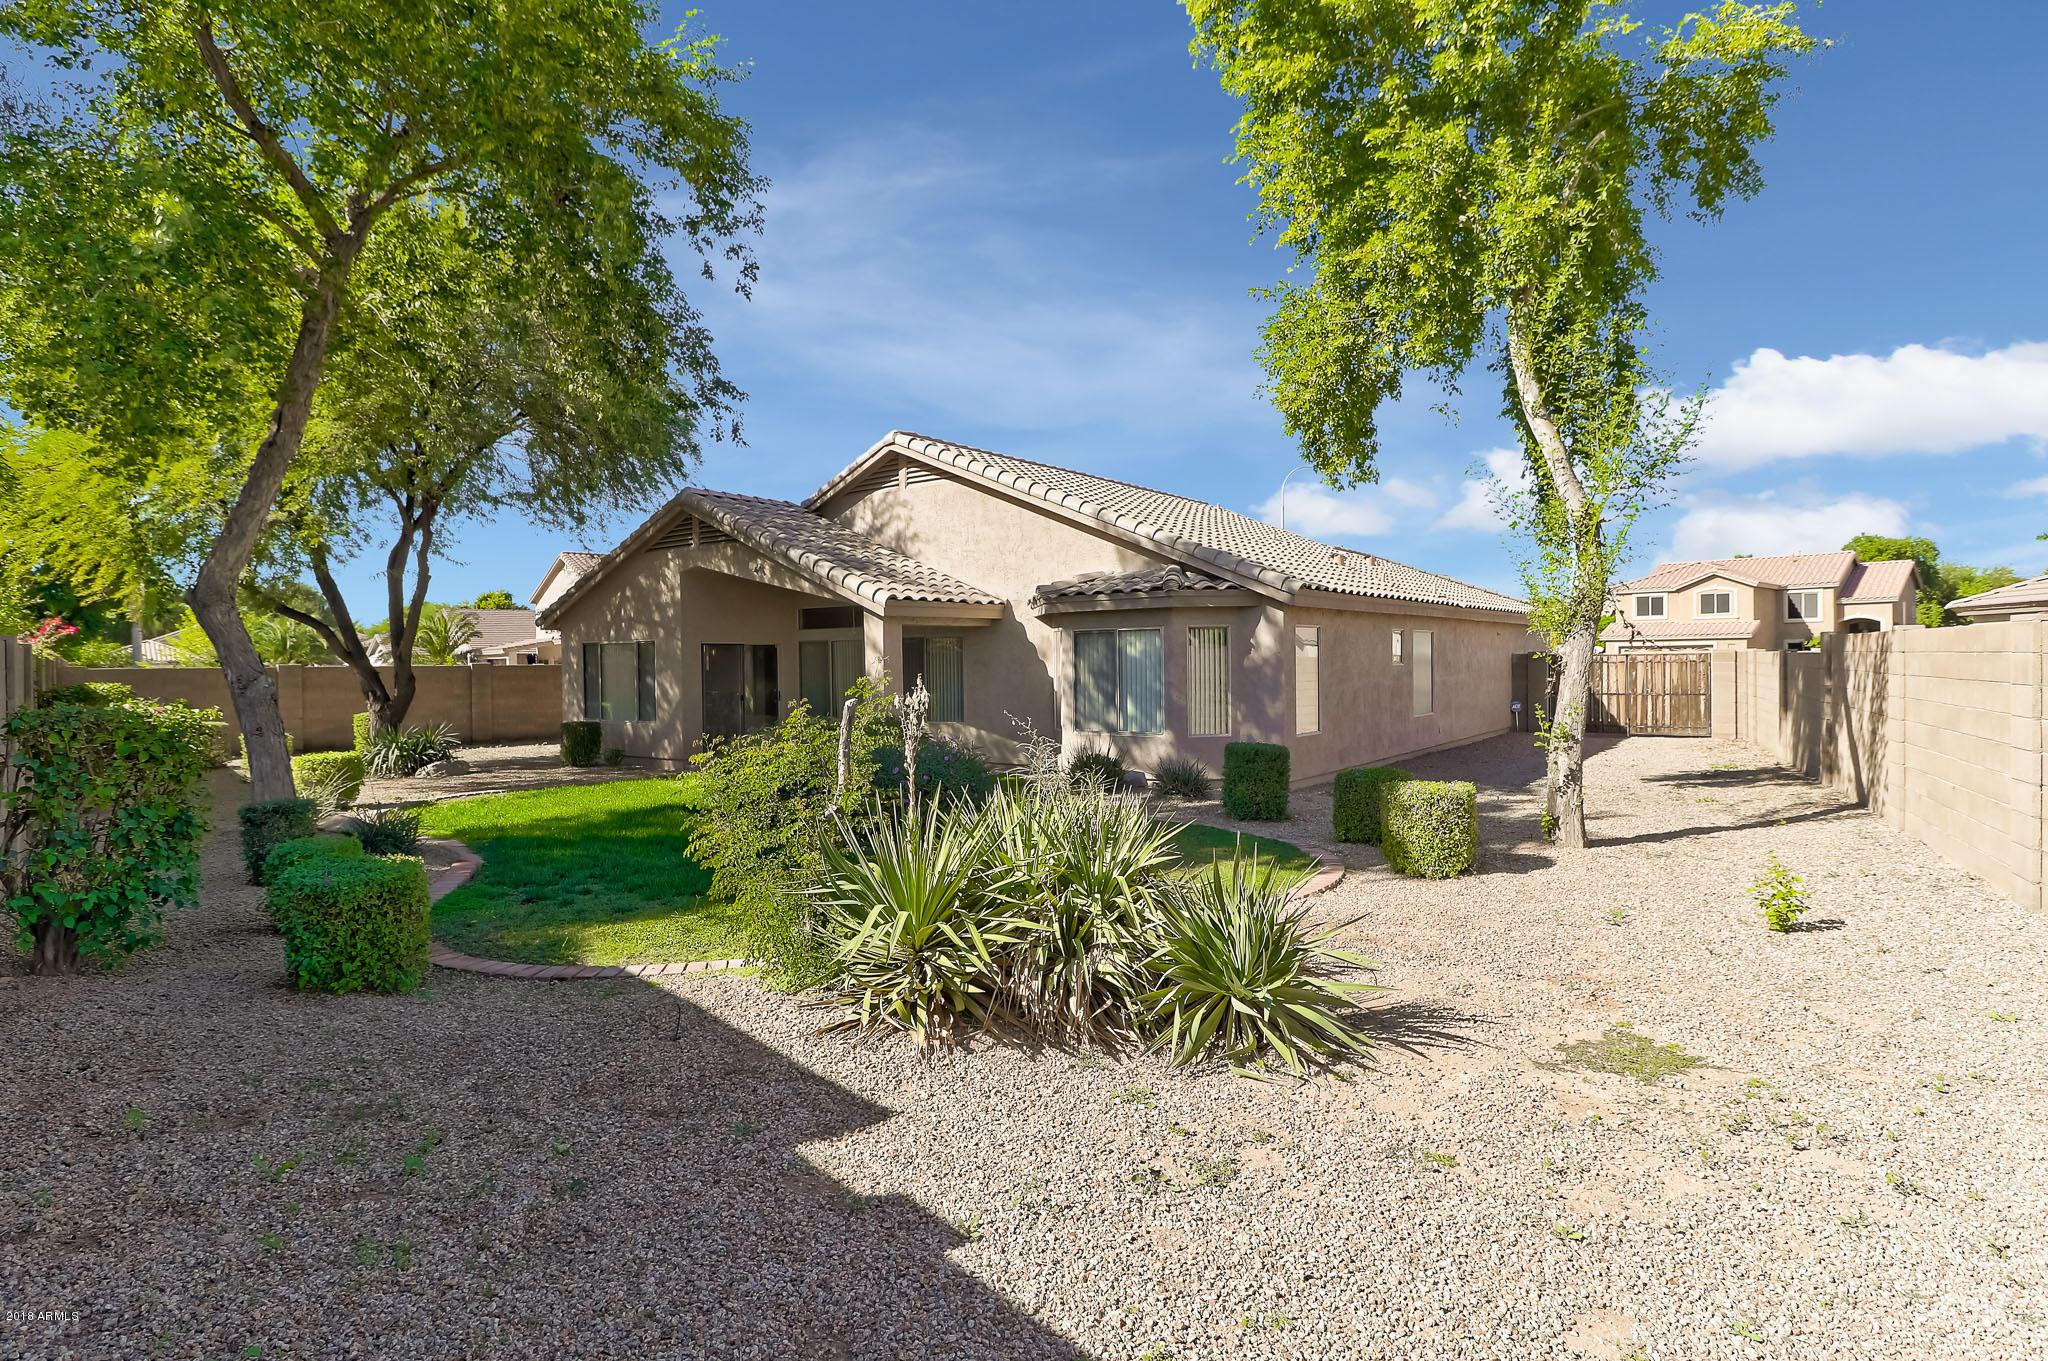 MLS 5898471 663 W Crane Court, Chandler, AZ 85286 Chandler AZ Carino Estates